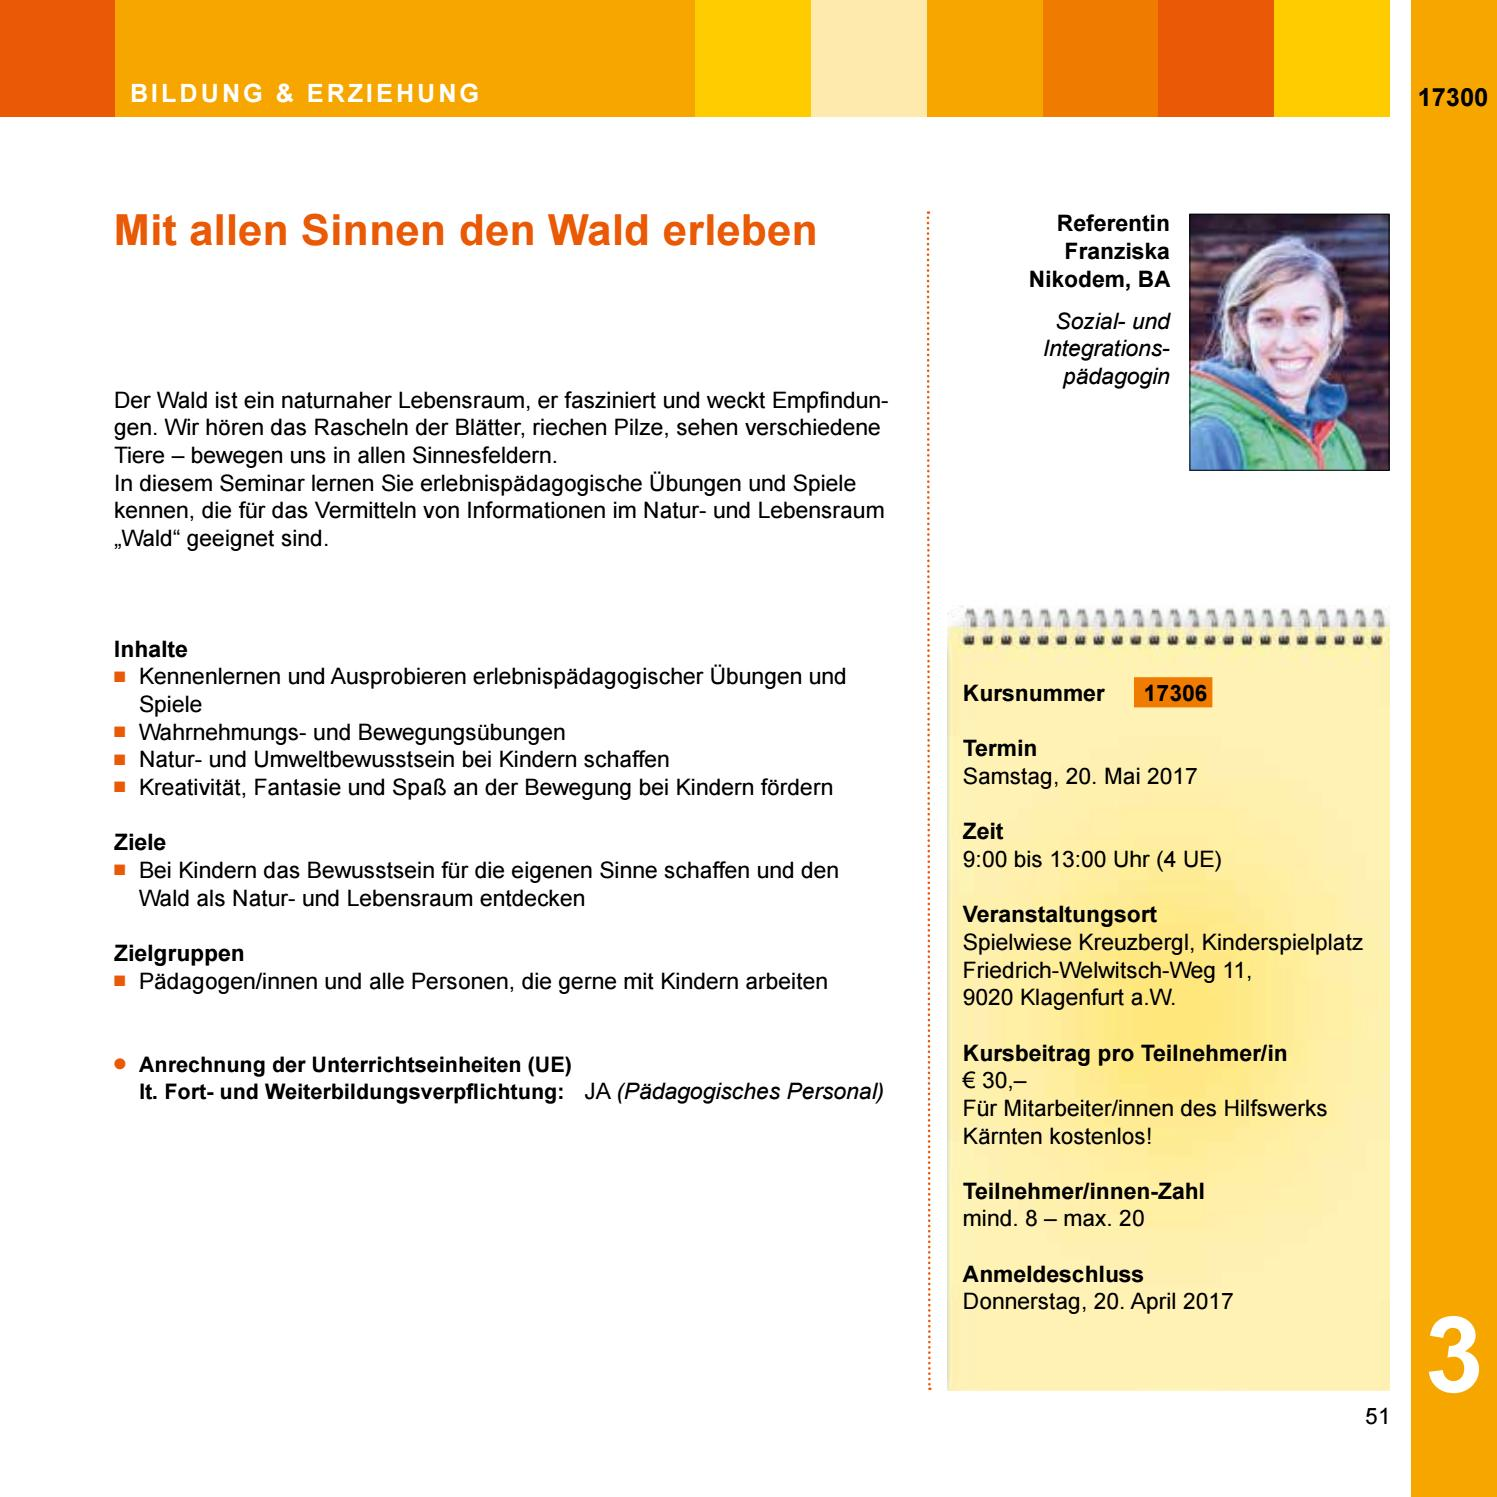 for Partnervermittlung schürmann apologise, but, opinion, you